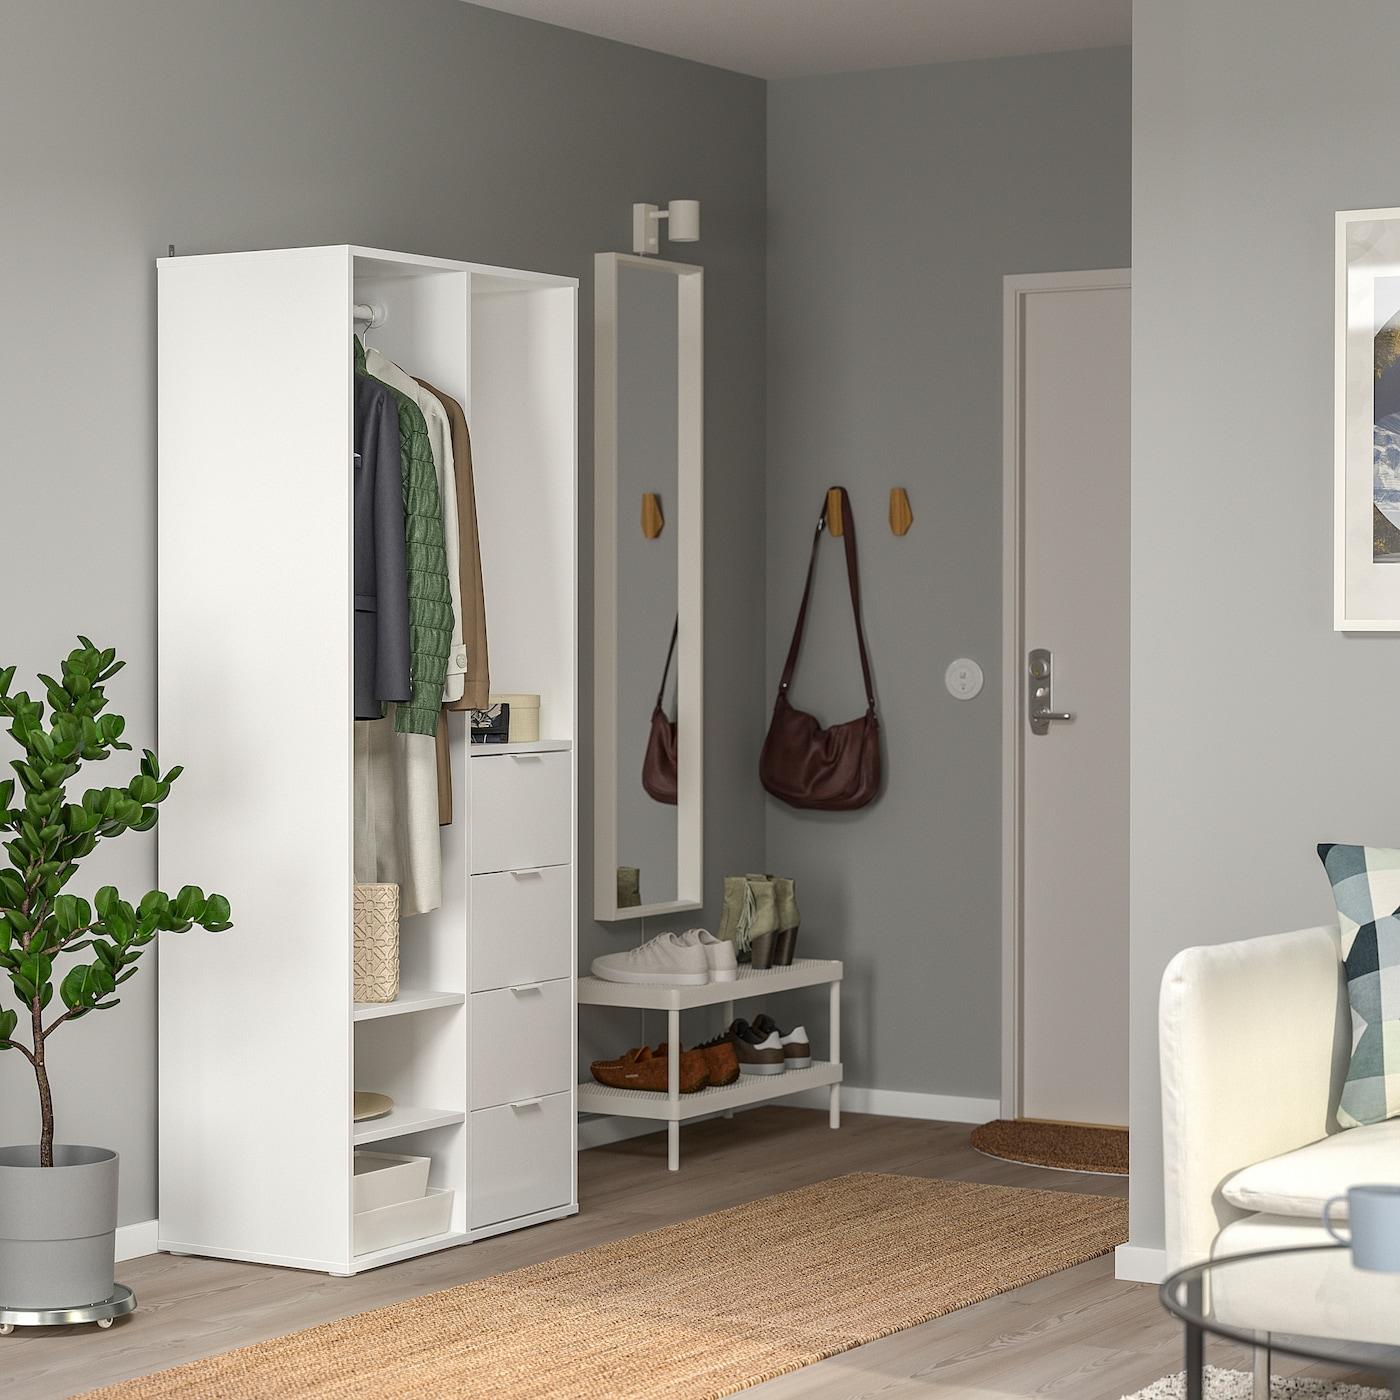 Armadio 8 Ante Ikea.Sundlandet Open Wardrobe White 31 1 8x17 3 8x73 5 8 Ikea